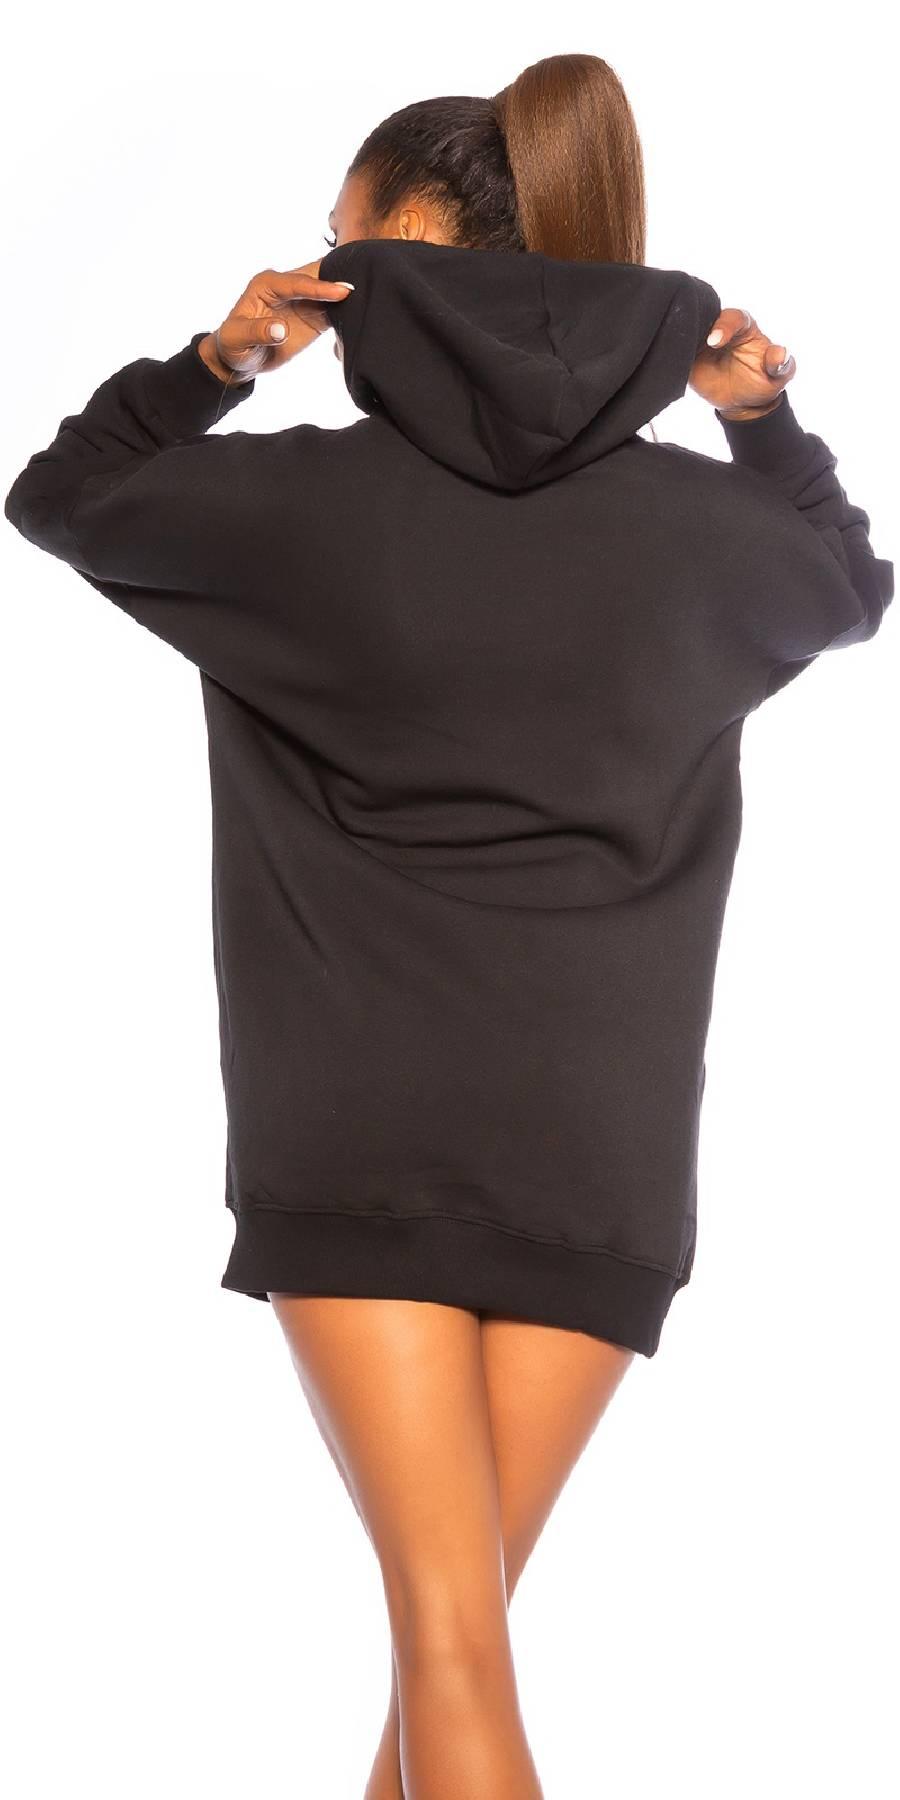 Sweat sexy sportswear APRIL couleur noir